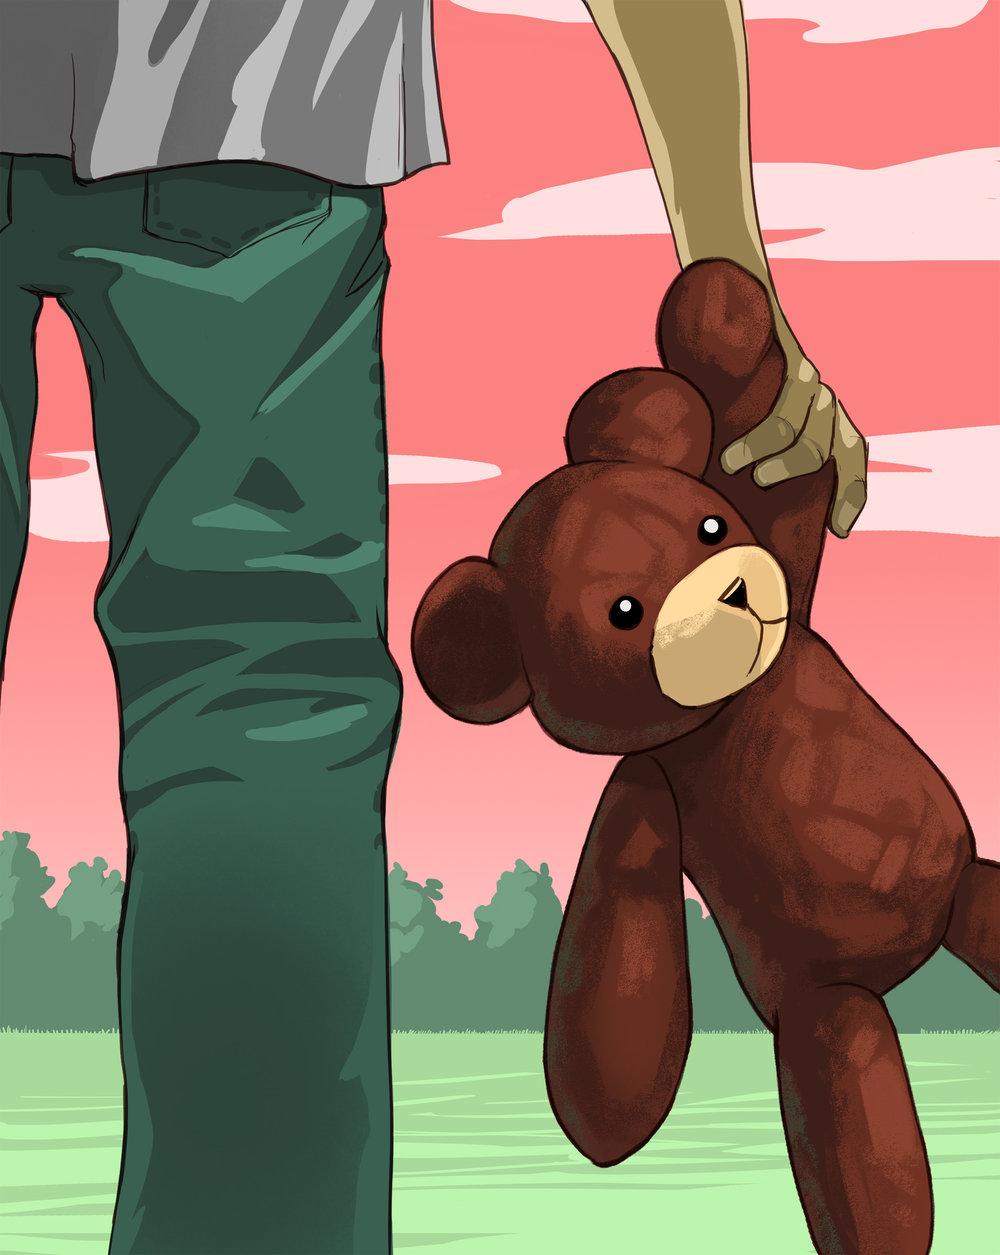 5thwave-bear.jpg